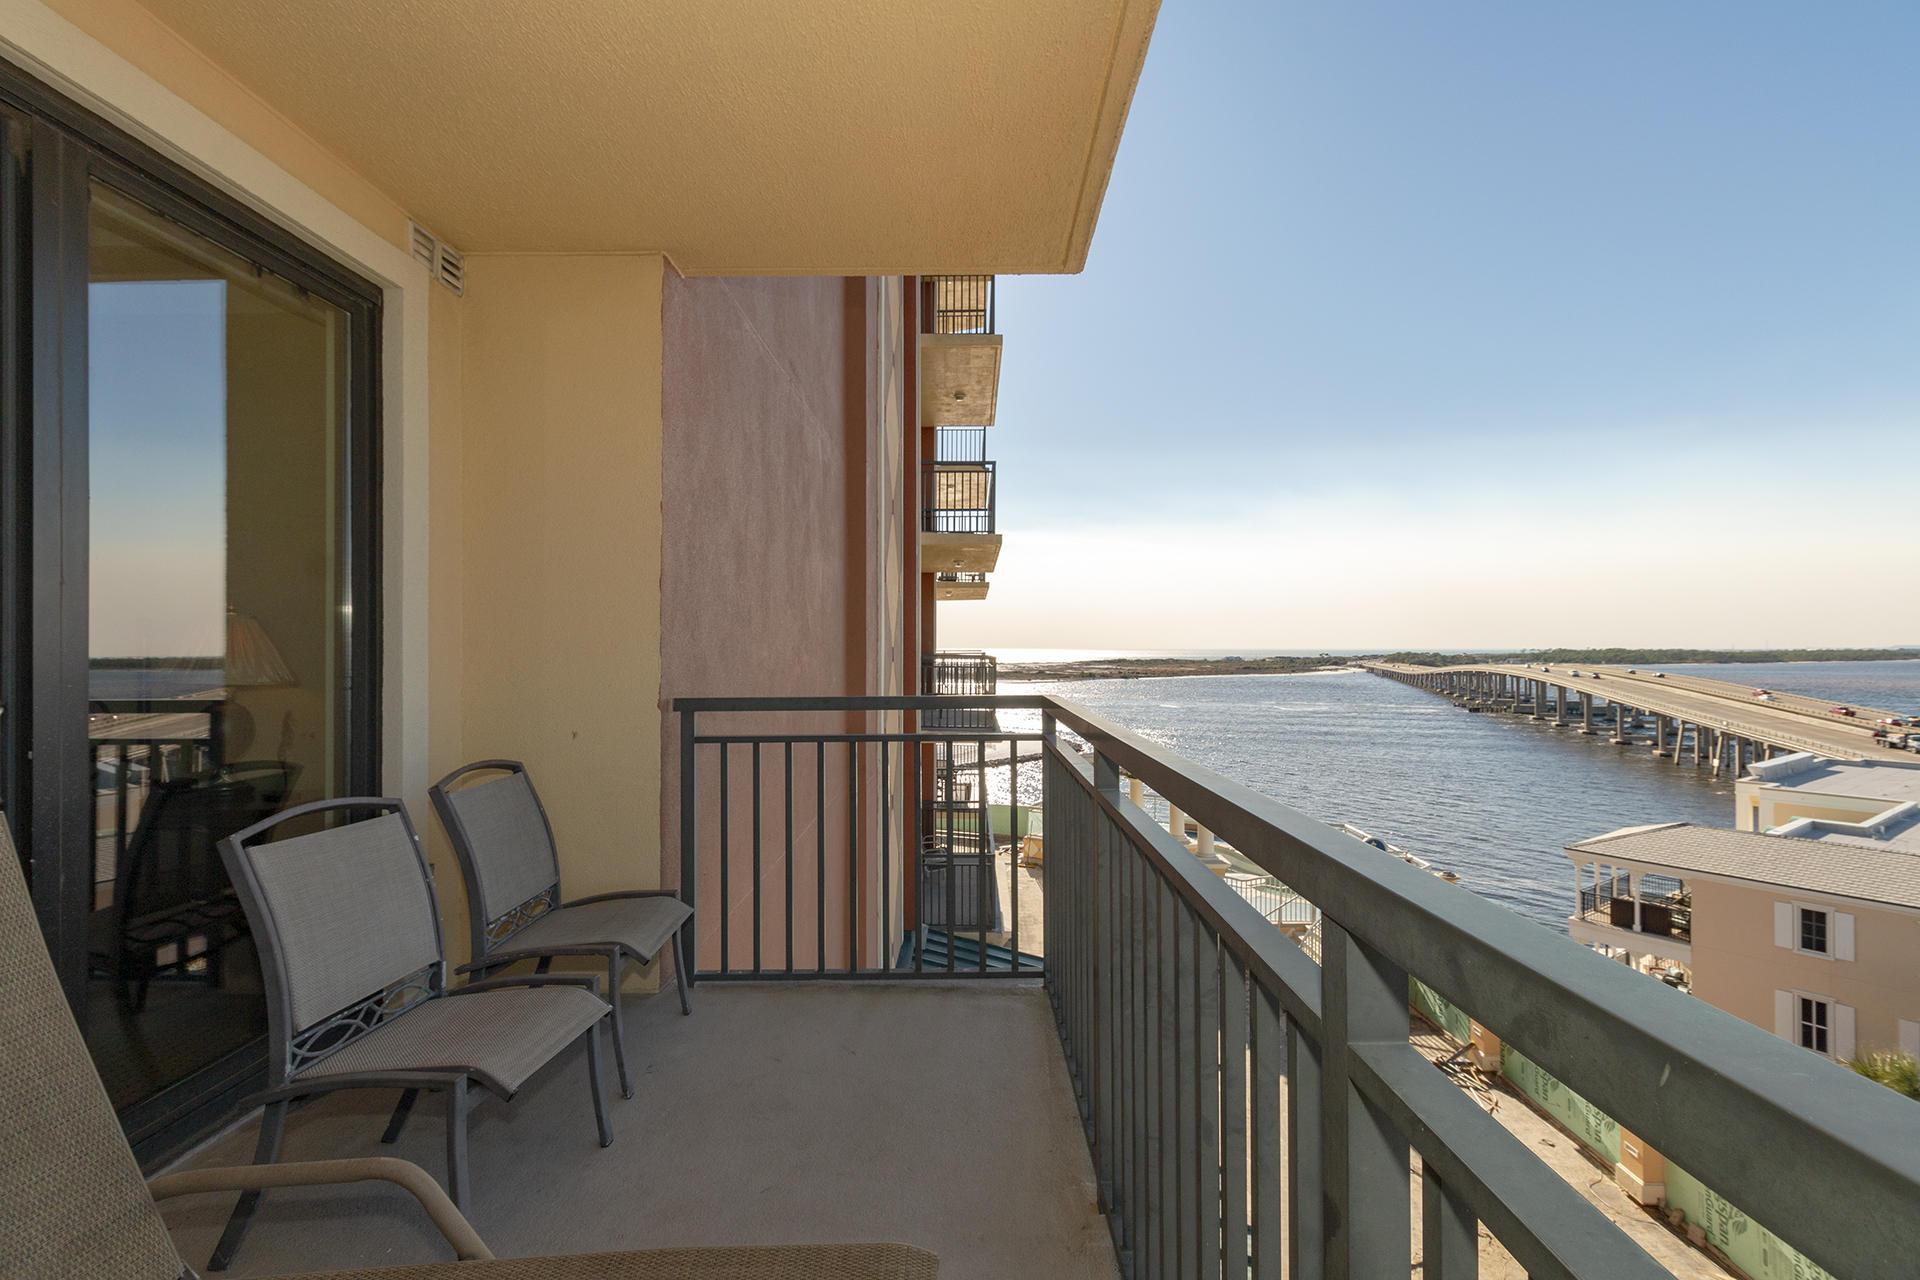 10 Harbor Boulevard - $550000